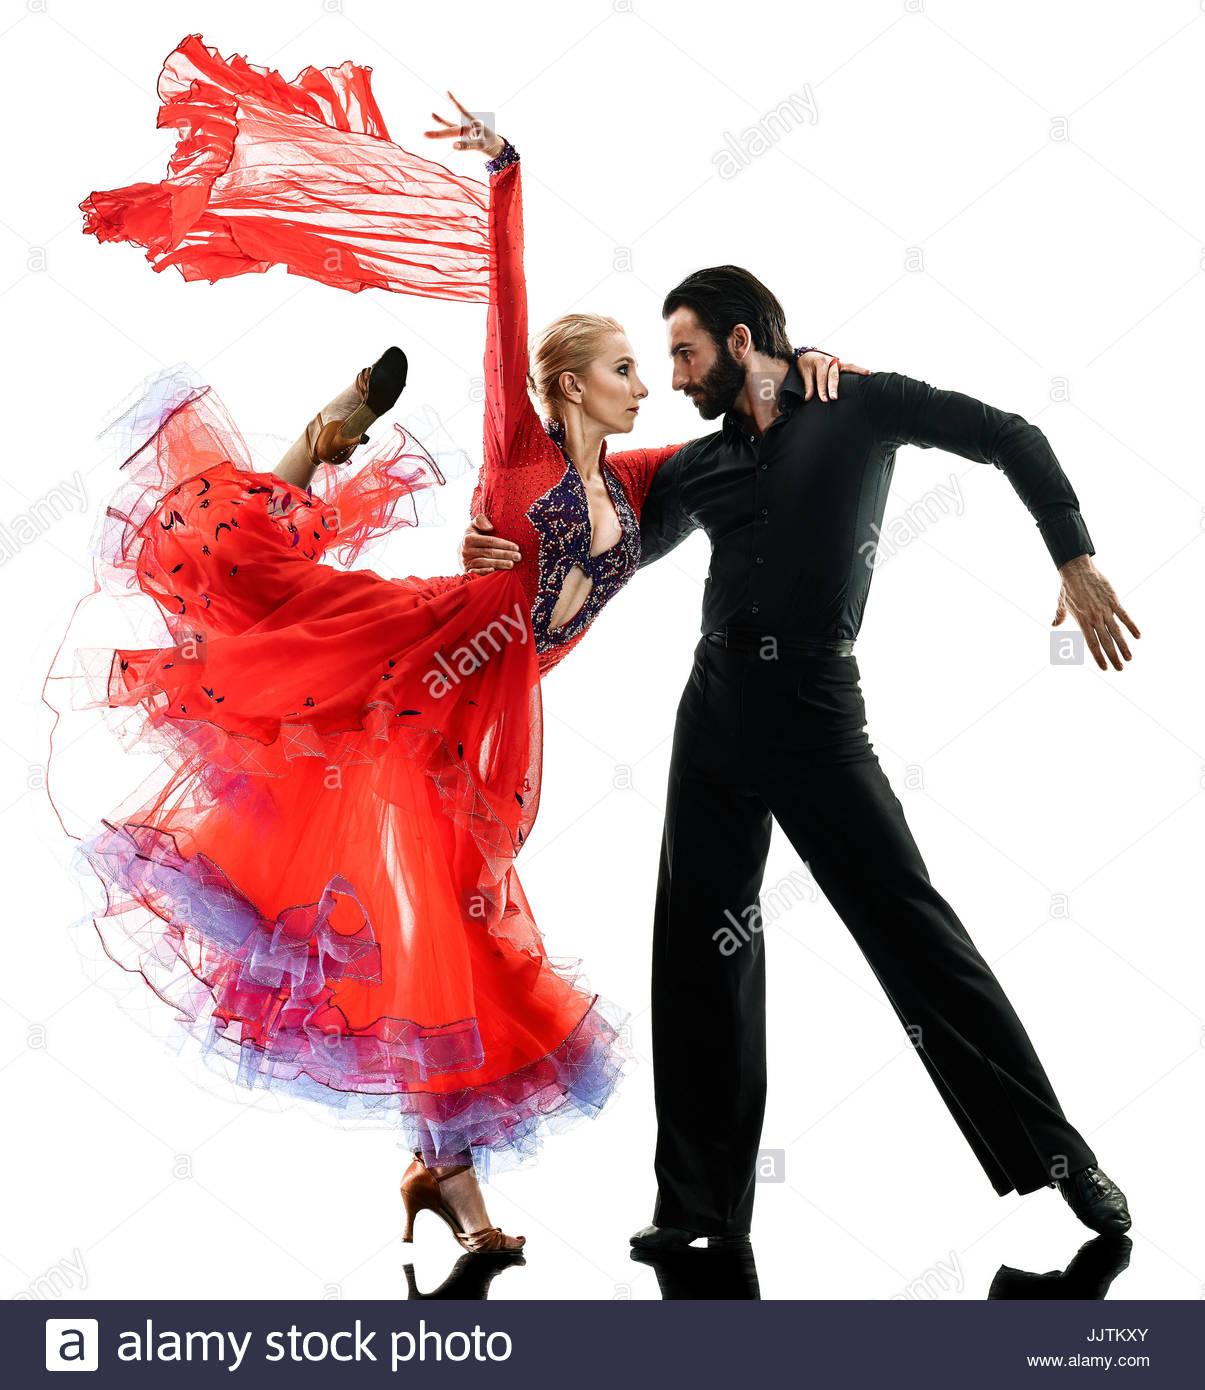 1205x1390 One Caucasian Man And Woman Couple Ballroom Tango Salsa Dancer